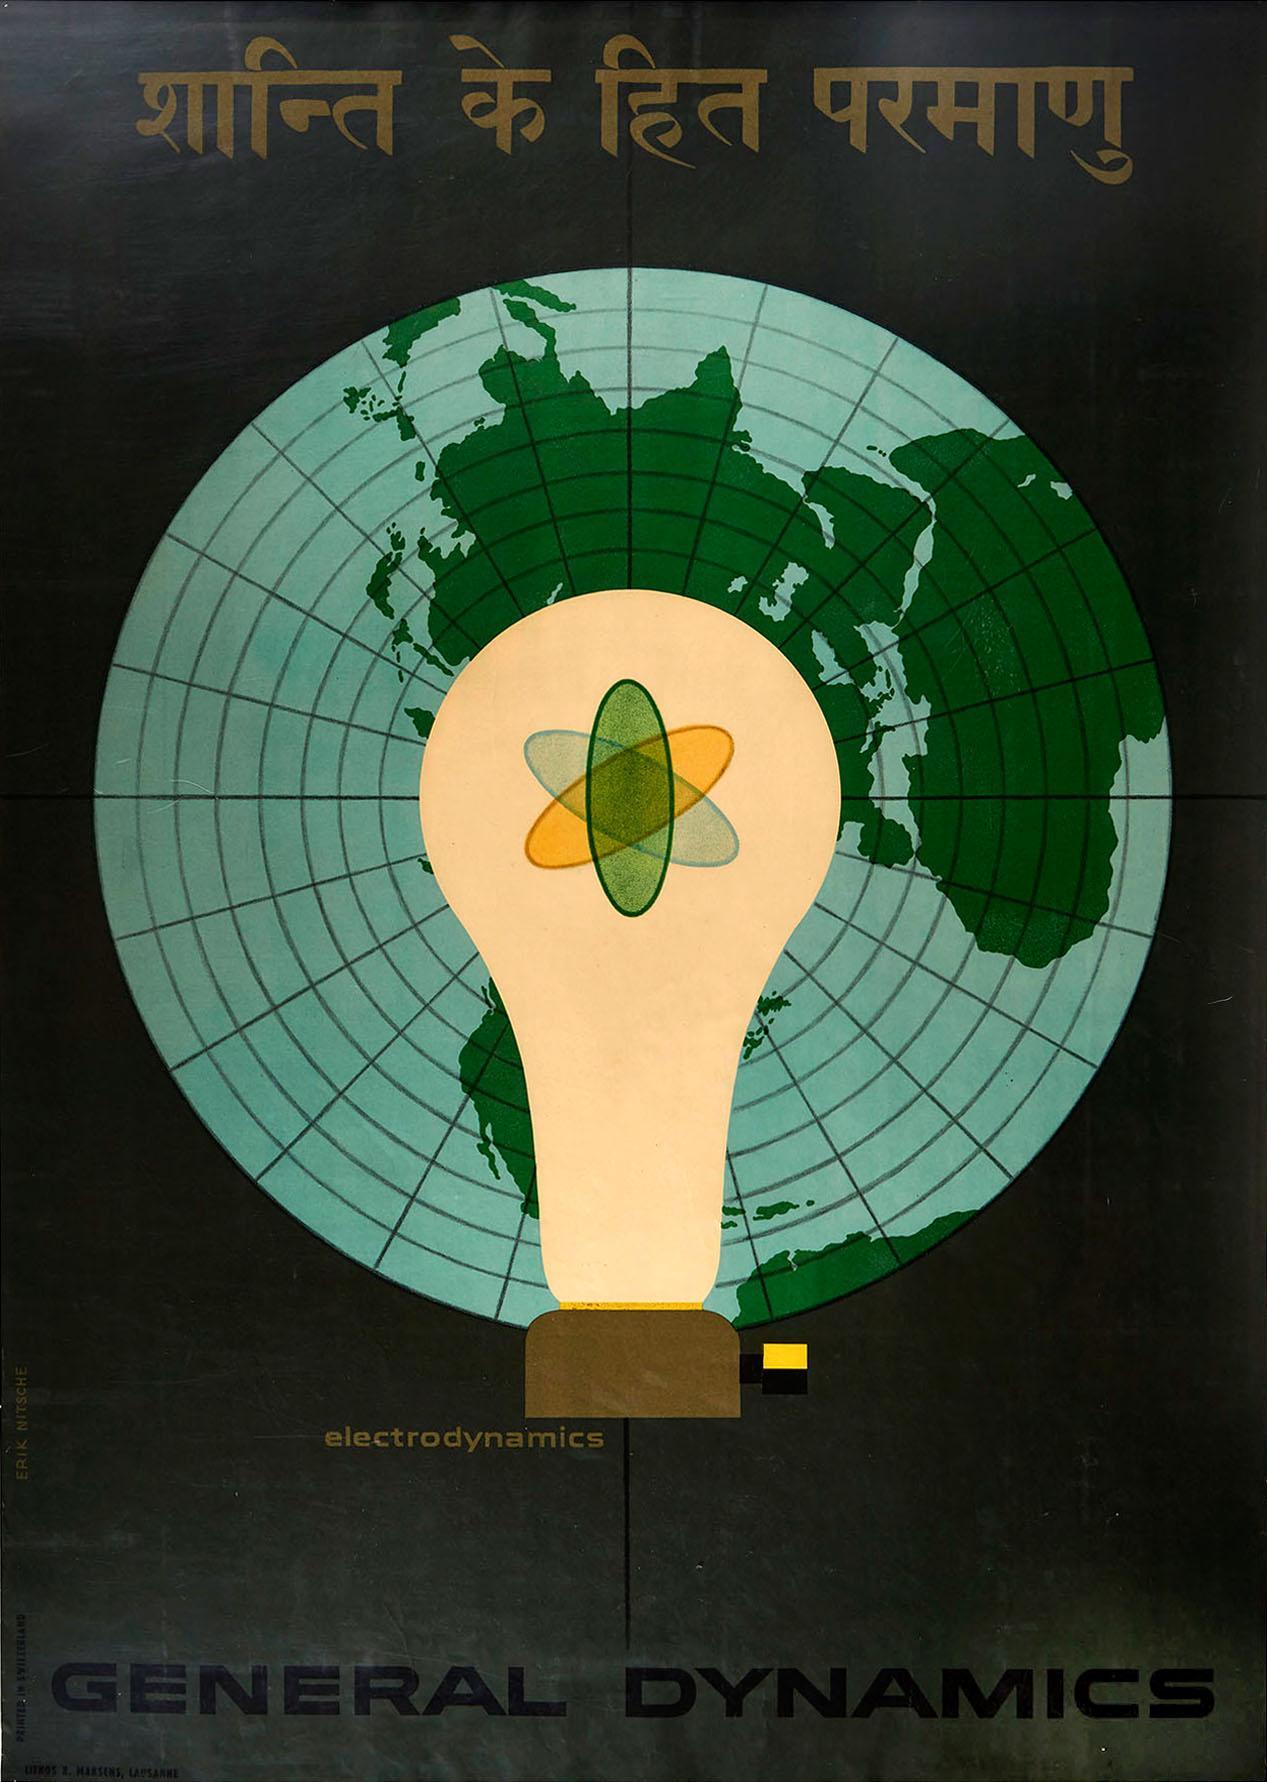 Original Vintage Poster General Dynamics Electrodynamics Atomic Energy Map Light